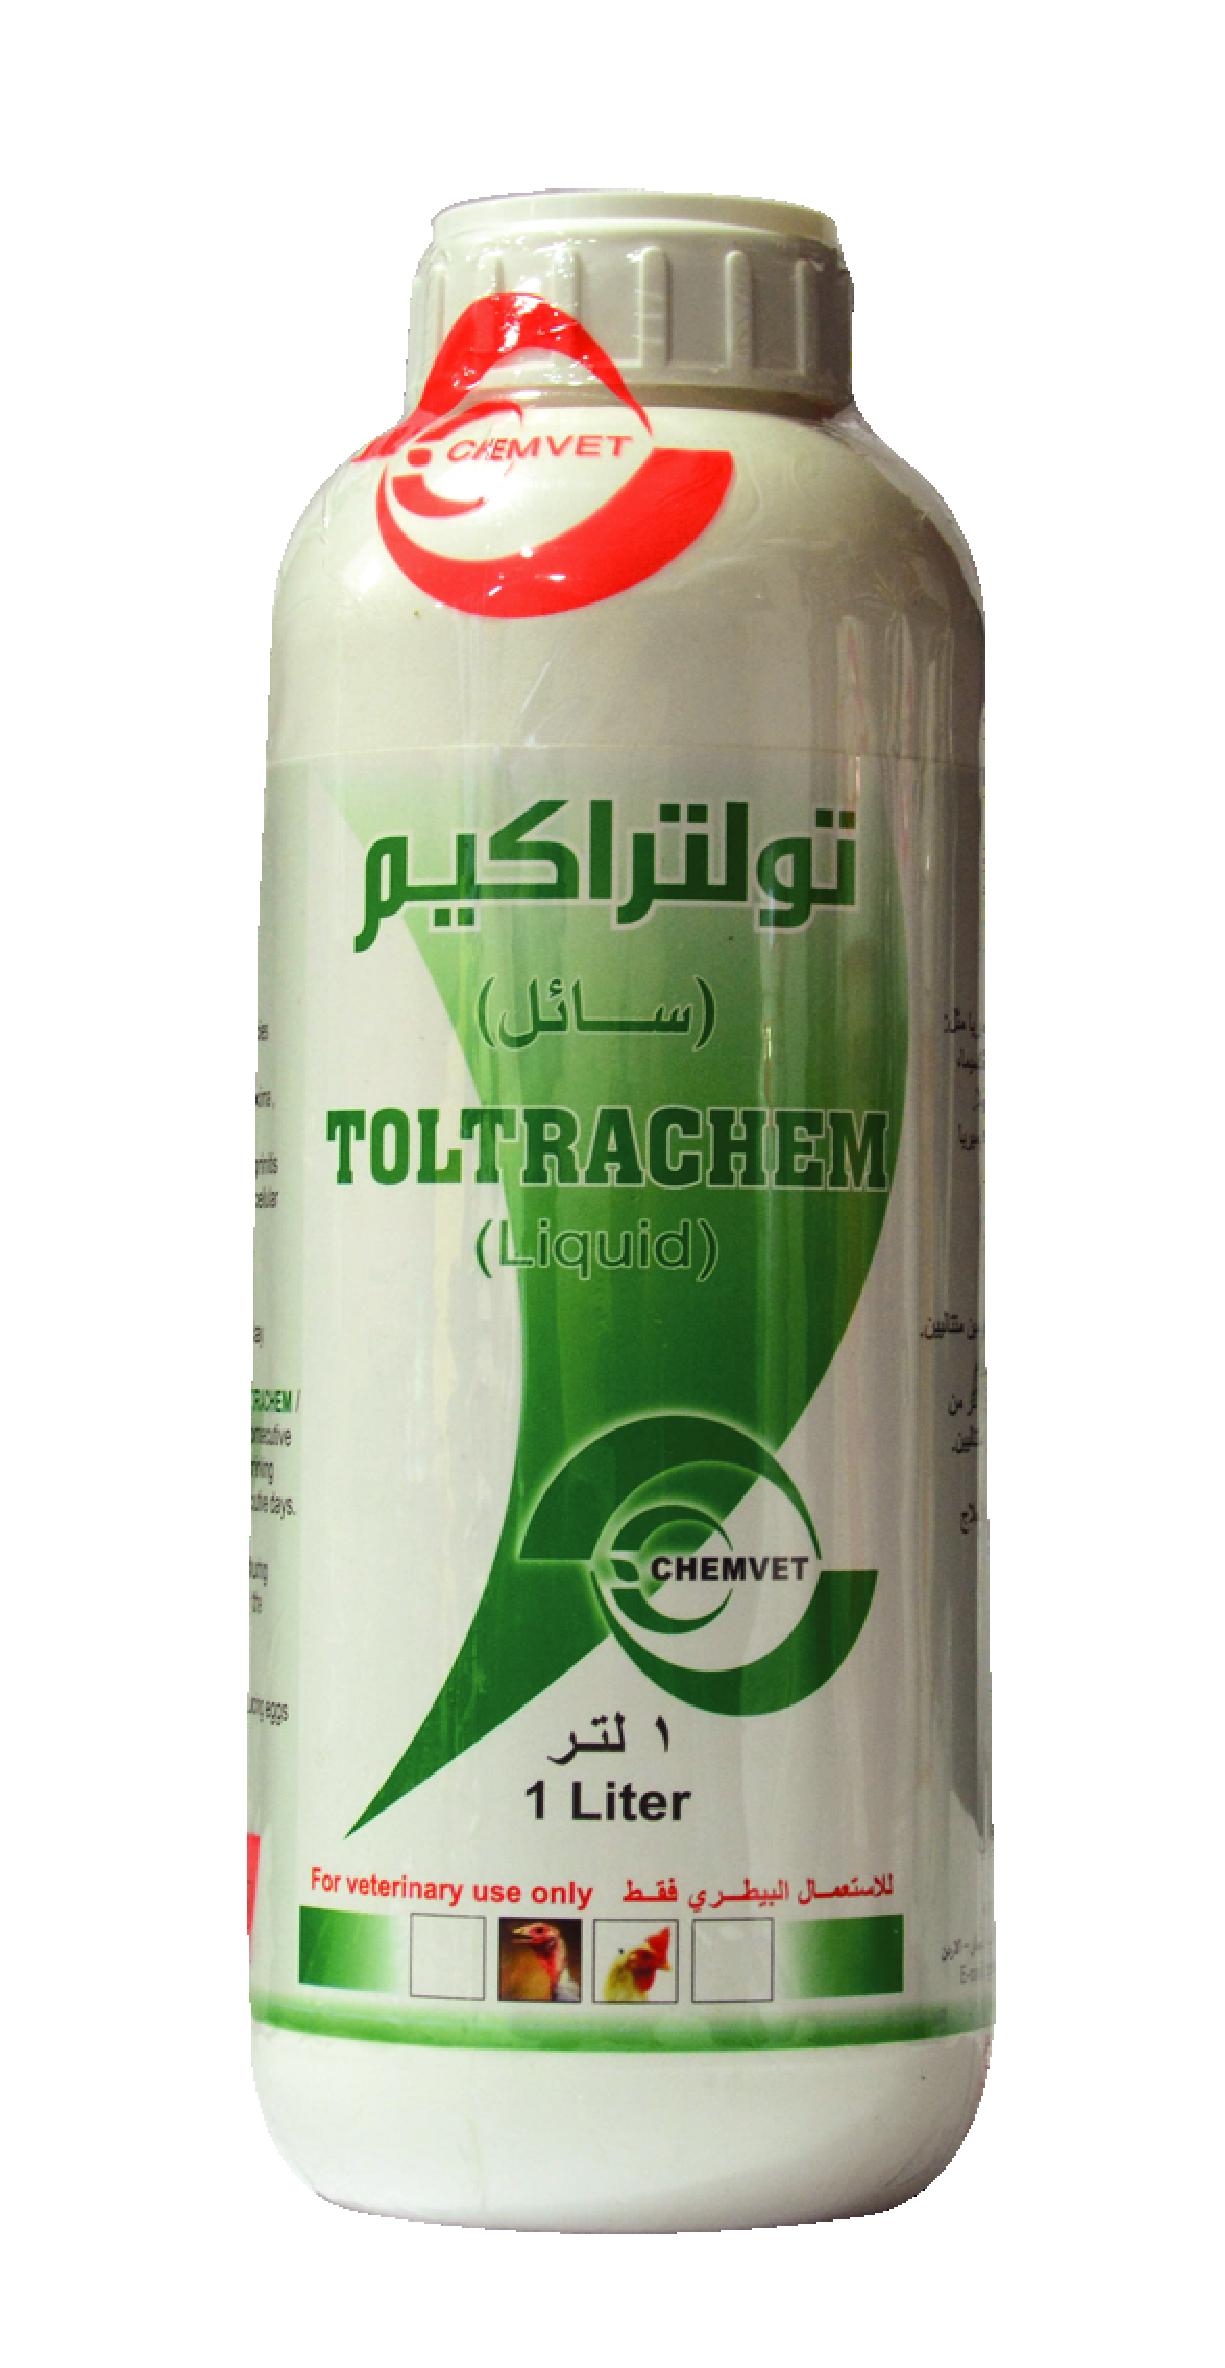 TOLTRACHEM